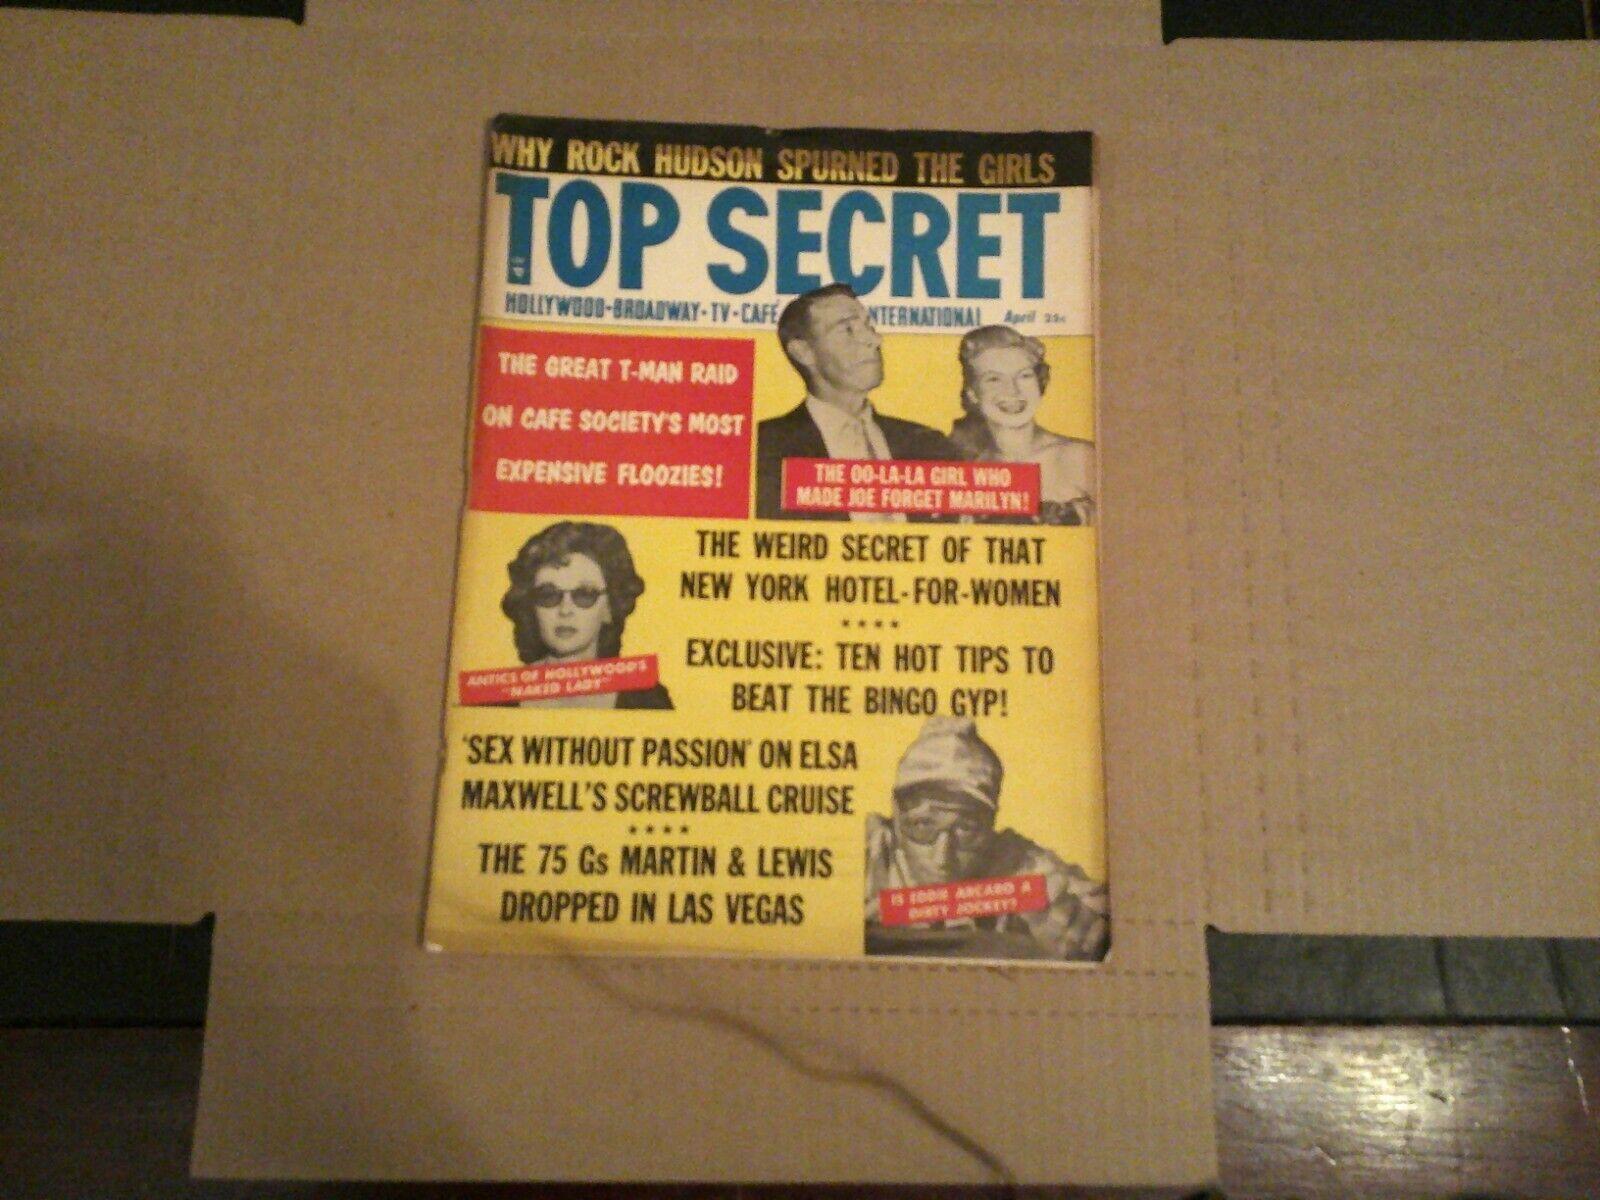 APR 1956 TOP SECRET MAGAZINE SCANDAL GOSSIP JOE DIMAGGIO VERONICA LAKE - $7.50